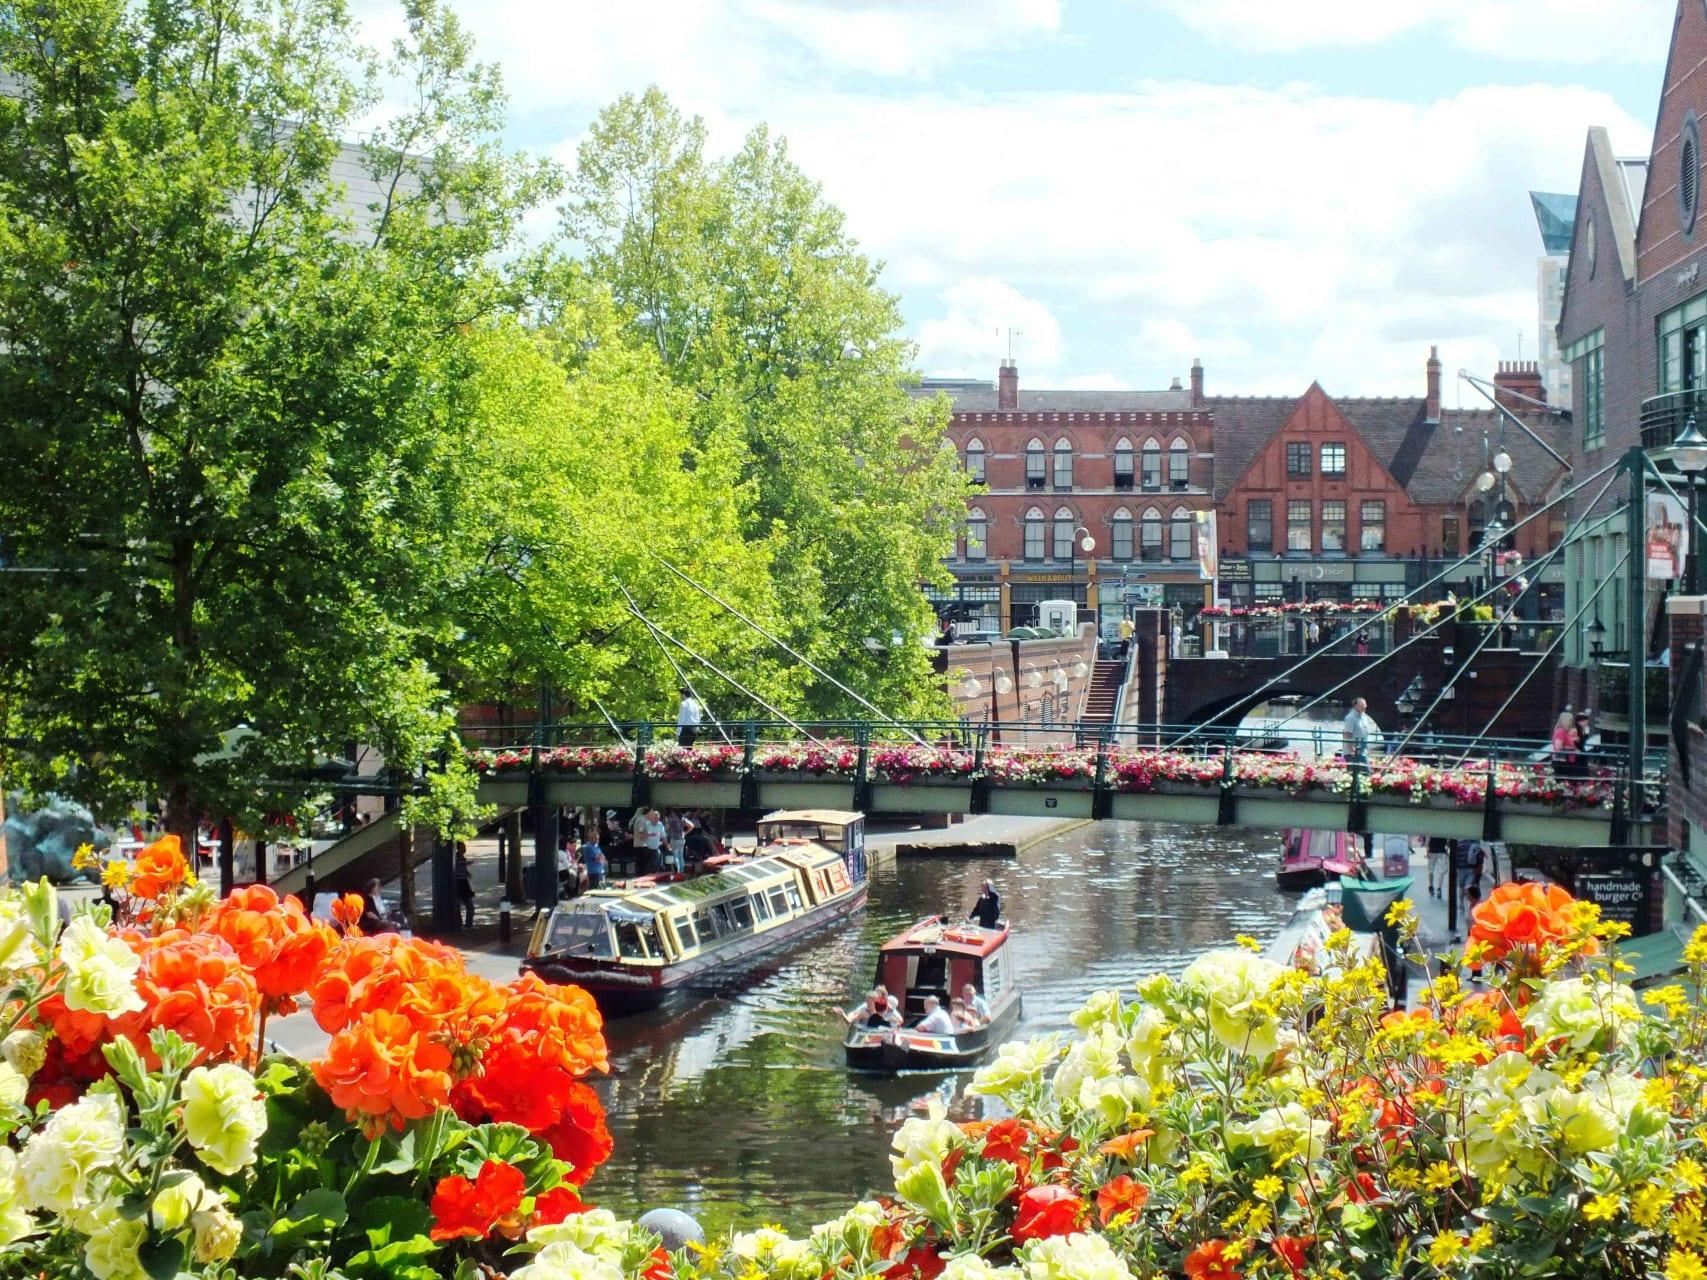 Birmingham - Bridges, Brawlers and Brewers